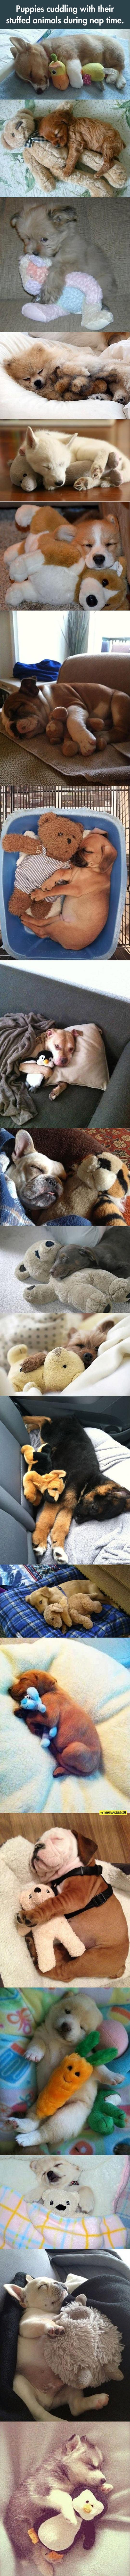 cool-cute-puppy-sleeping-toys